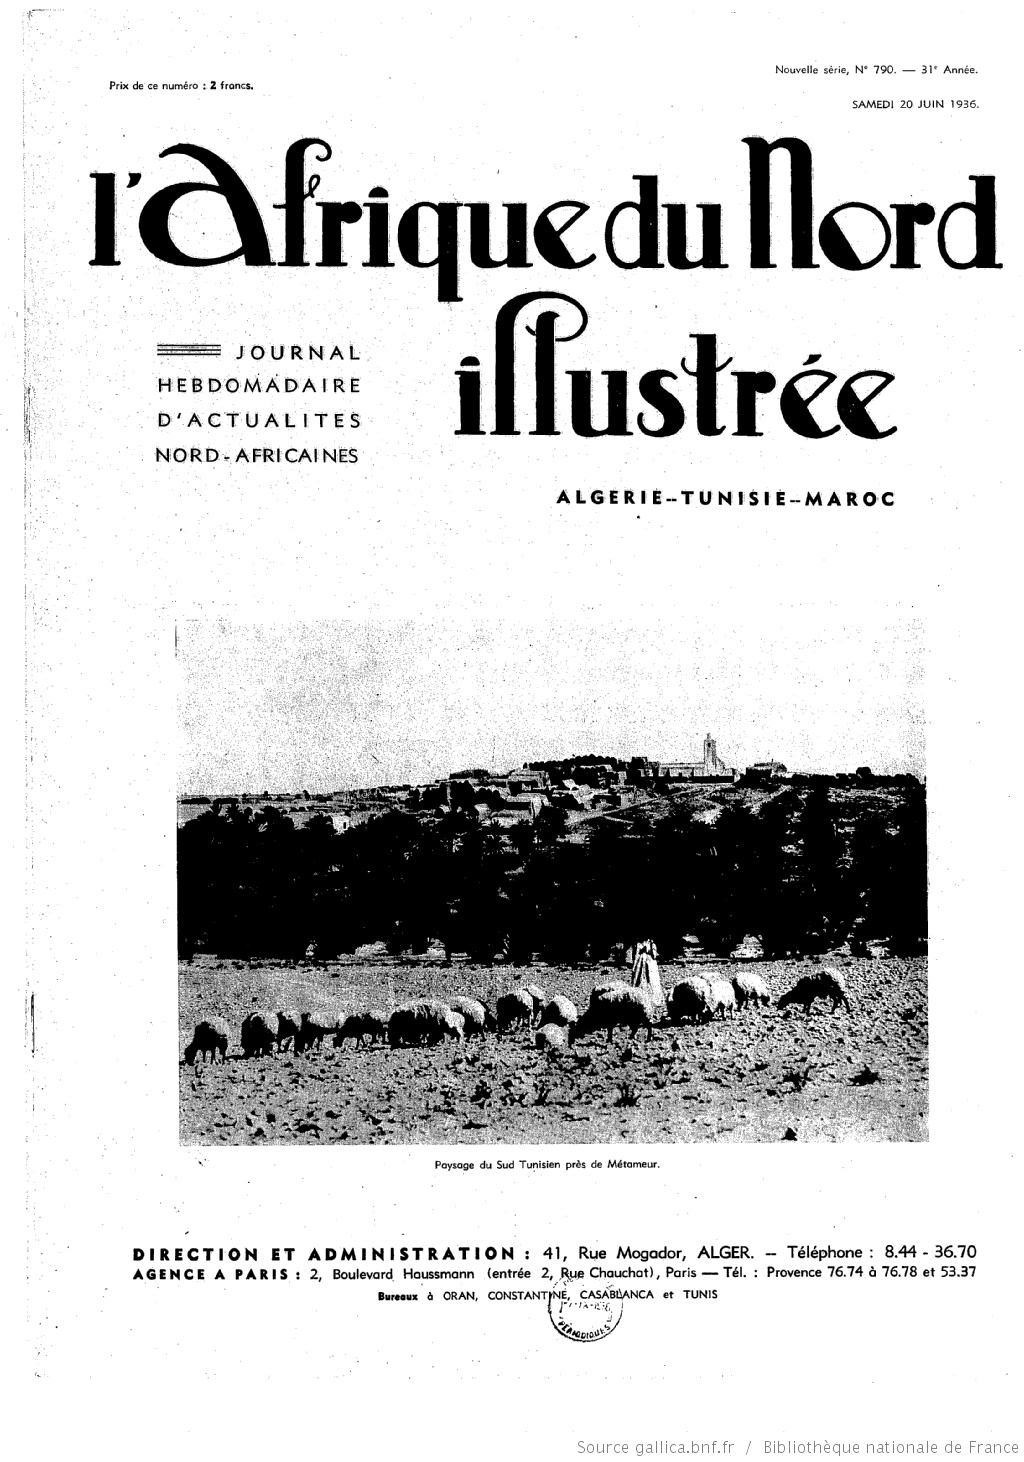 L'Afrique du Nord illustrée, 20 juin 1936 | Source : Gallica.fr BnF